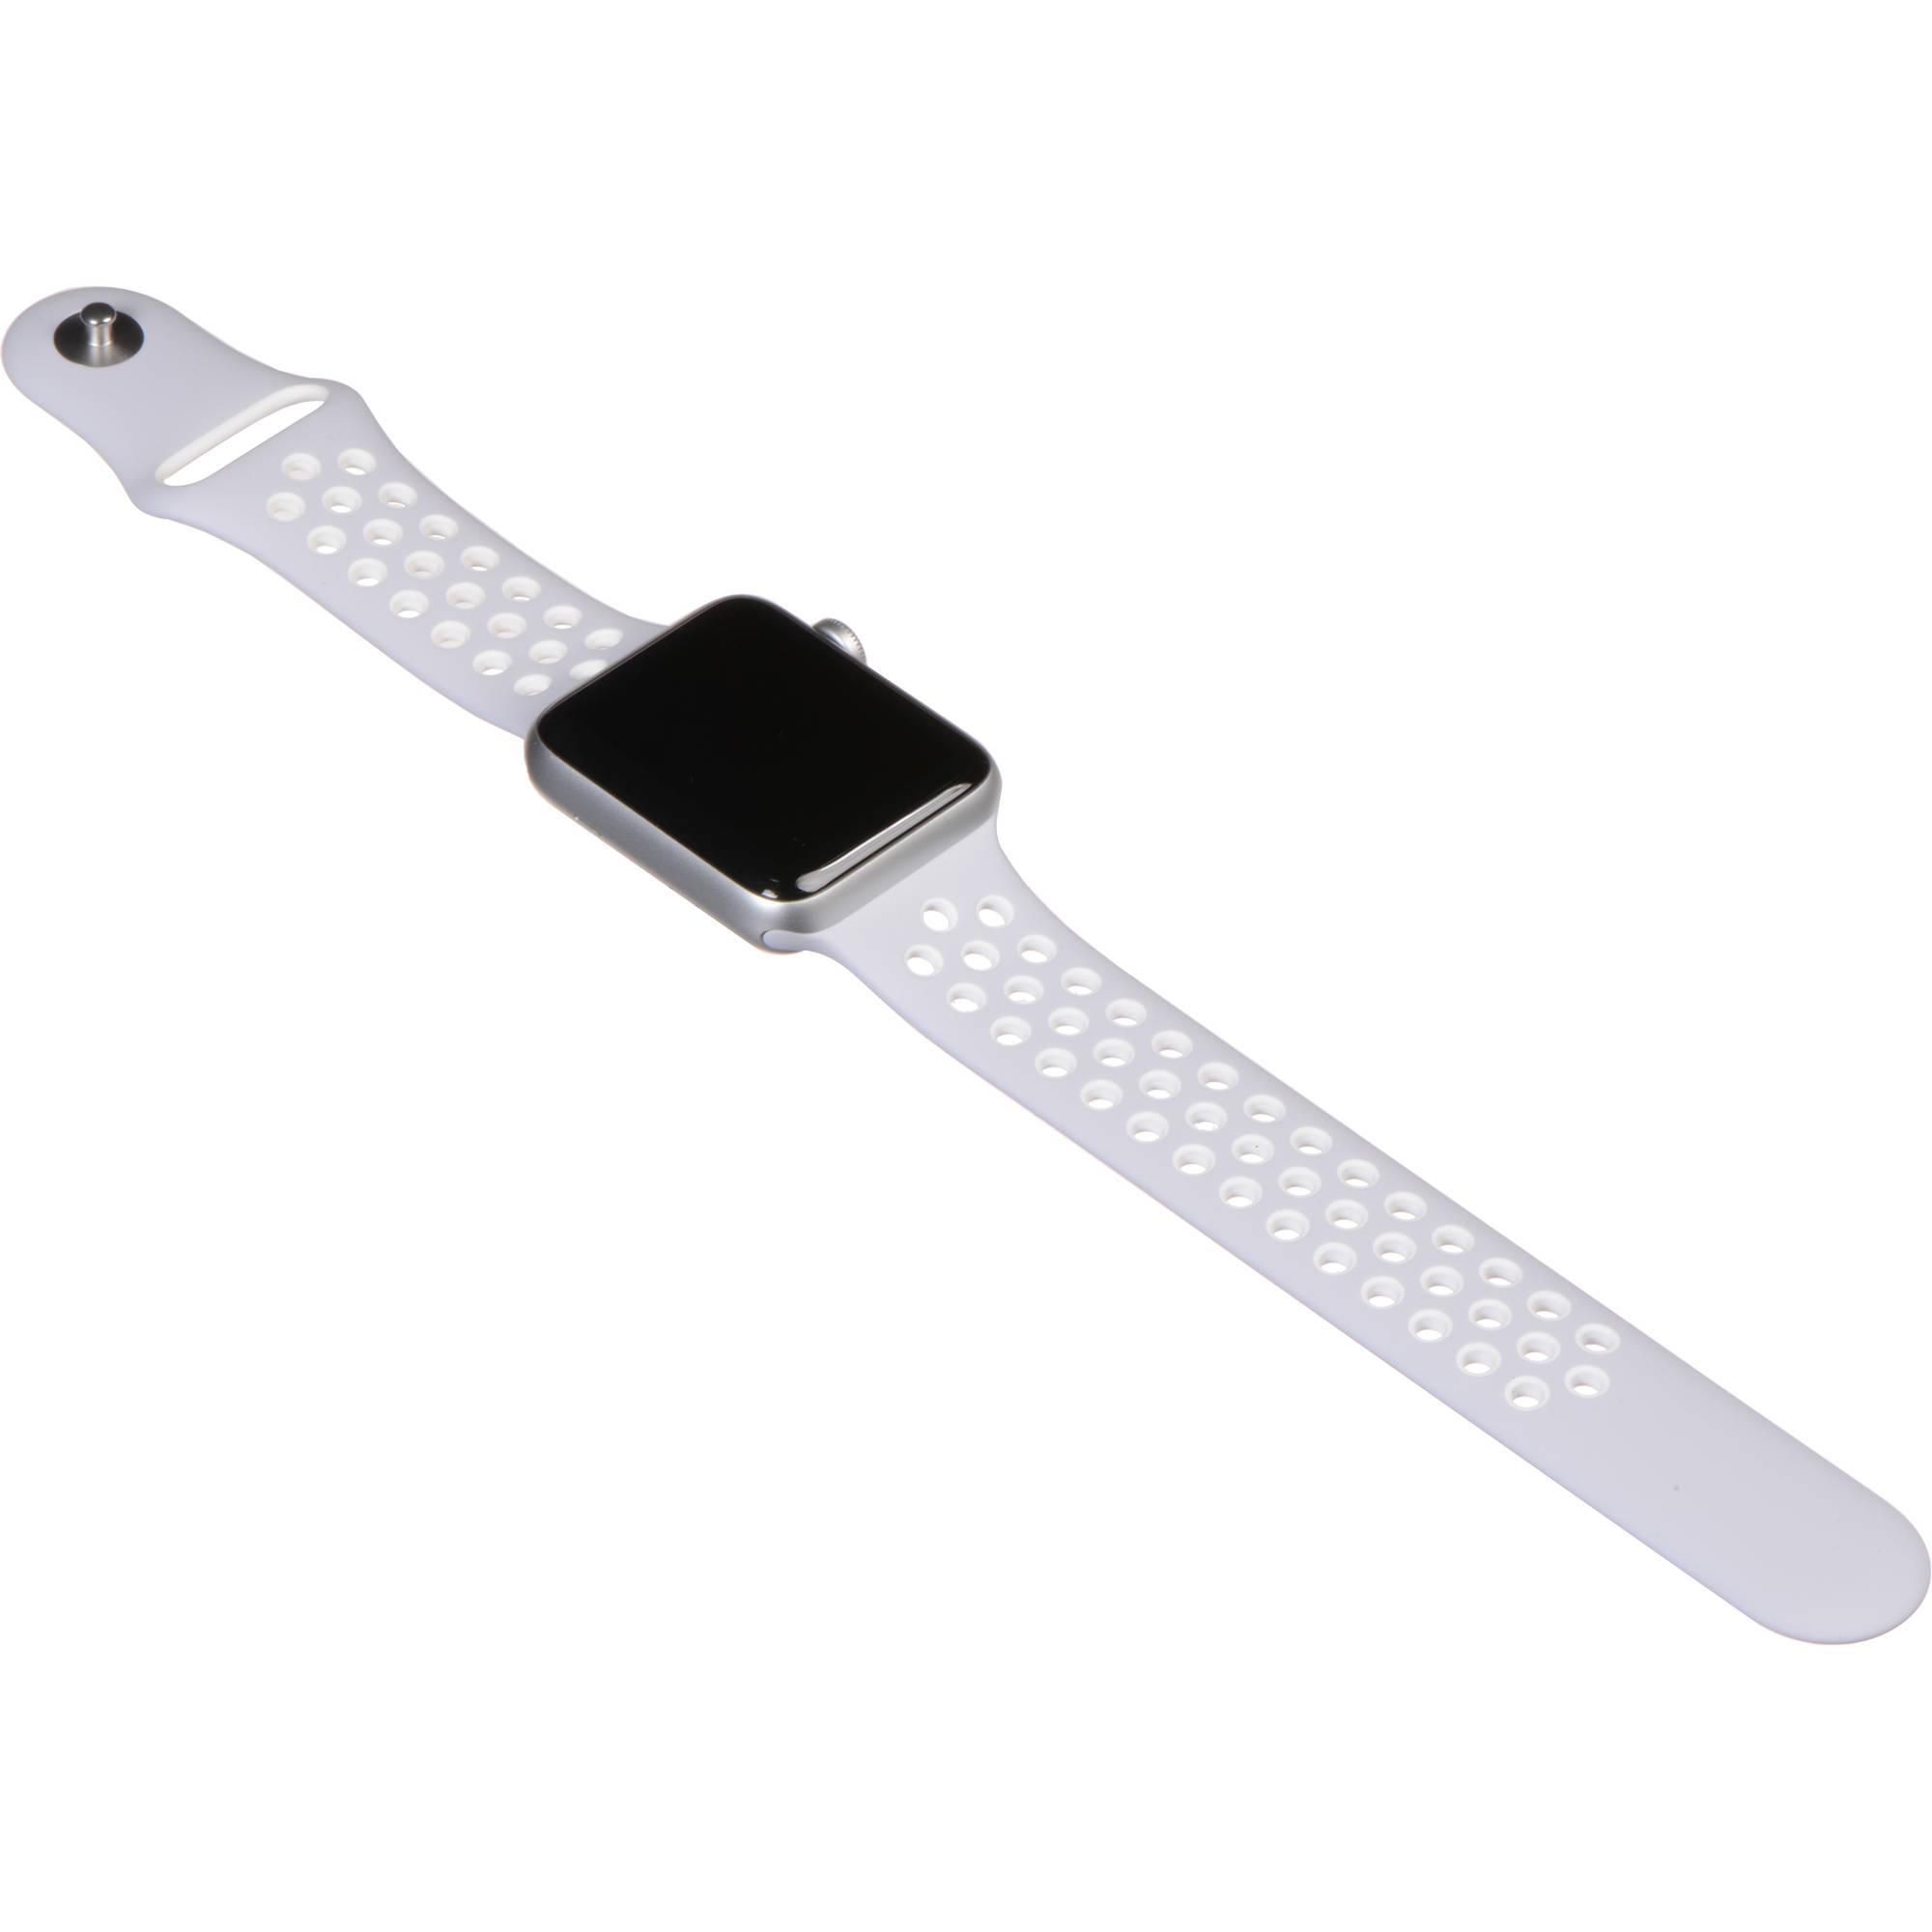 lechuga Dar permiso Chaqueta  Apple Watch Nike+ Series 2 42mm Smartwatch MQ192LL/A B&H Photo